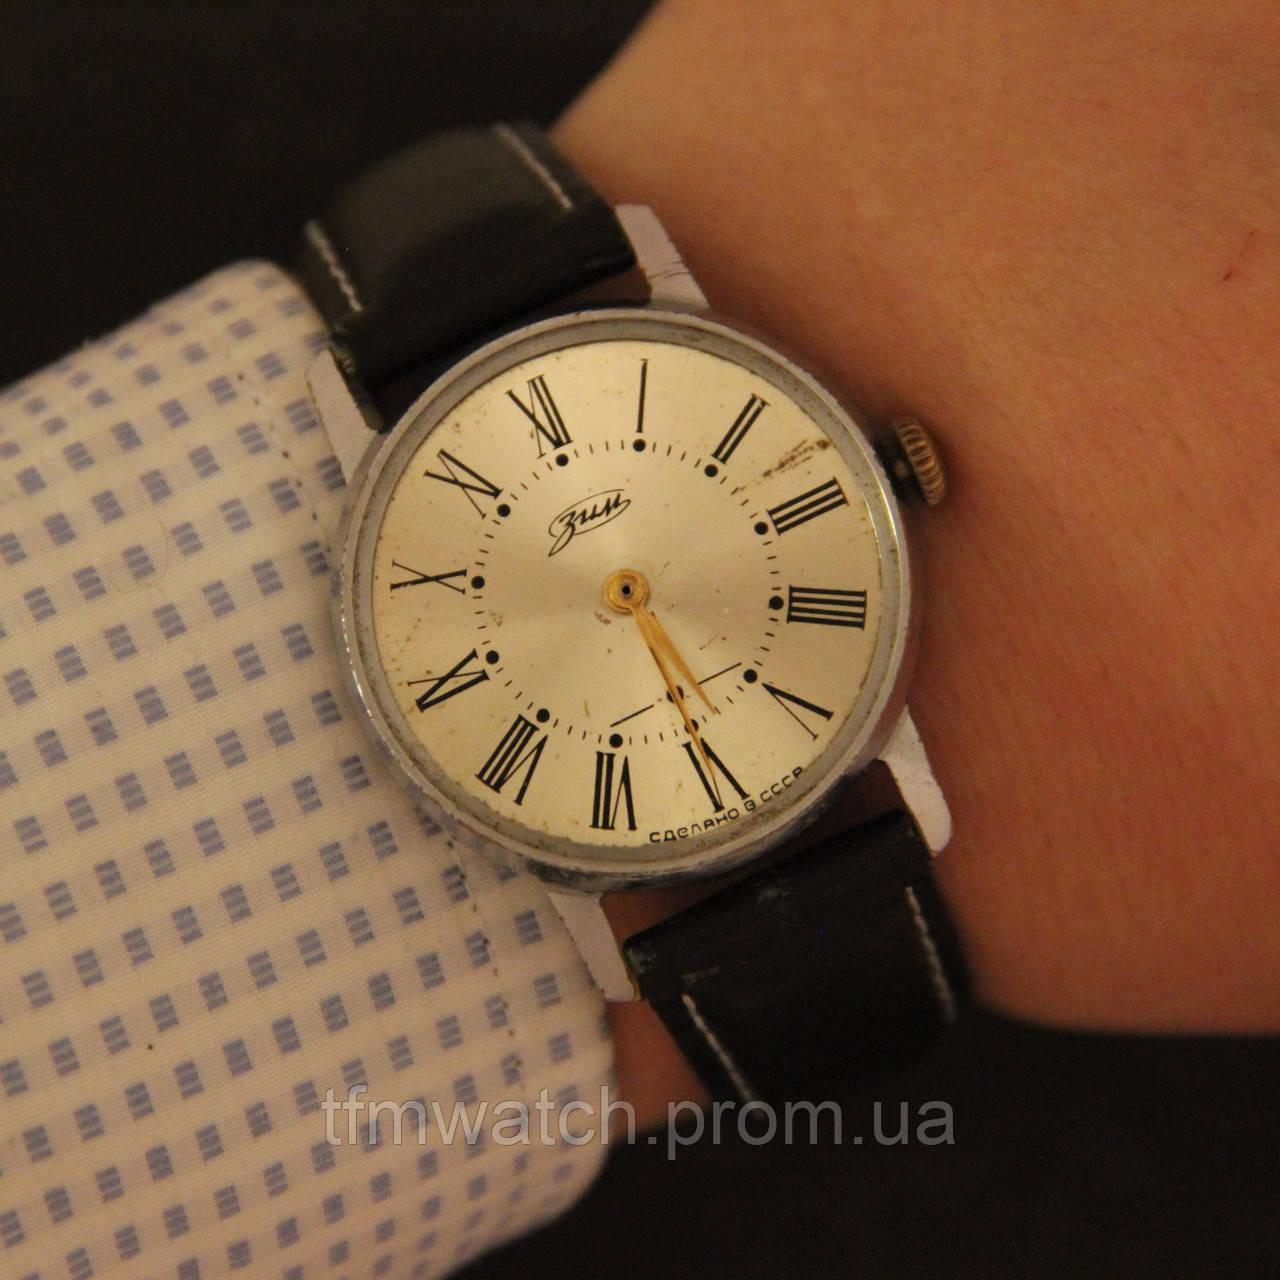 Продажа антиквариата - часы зим